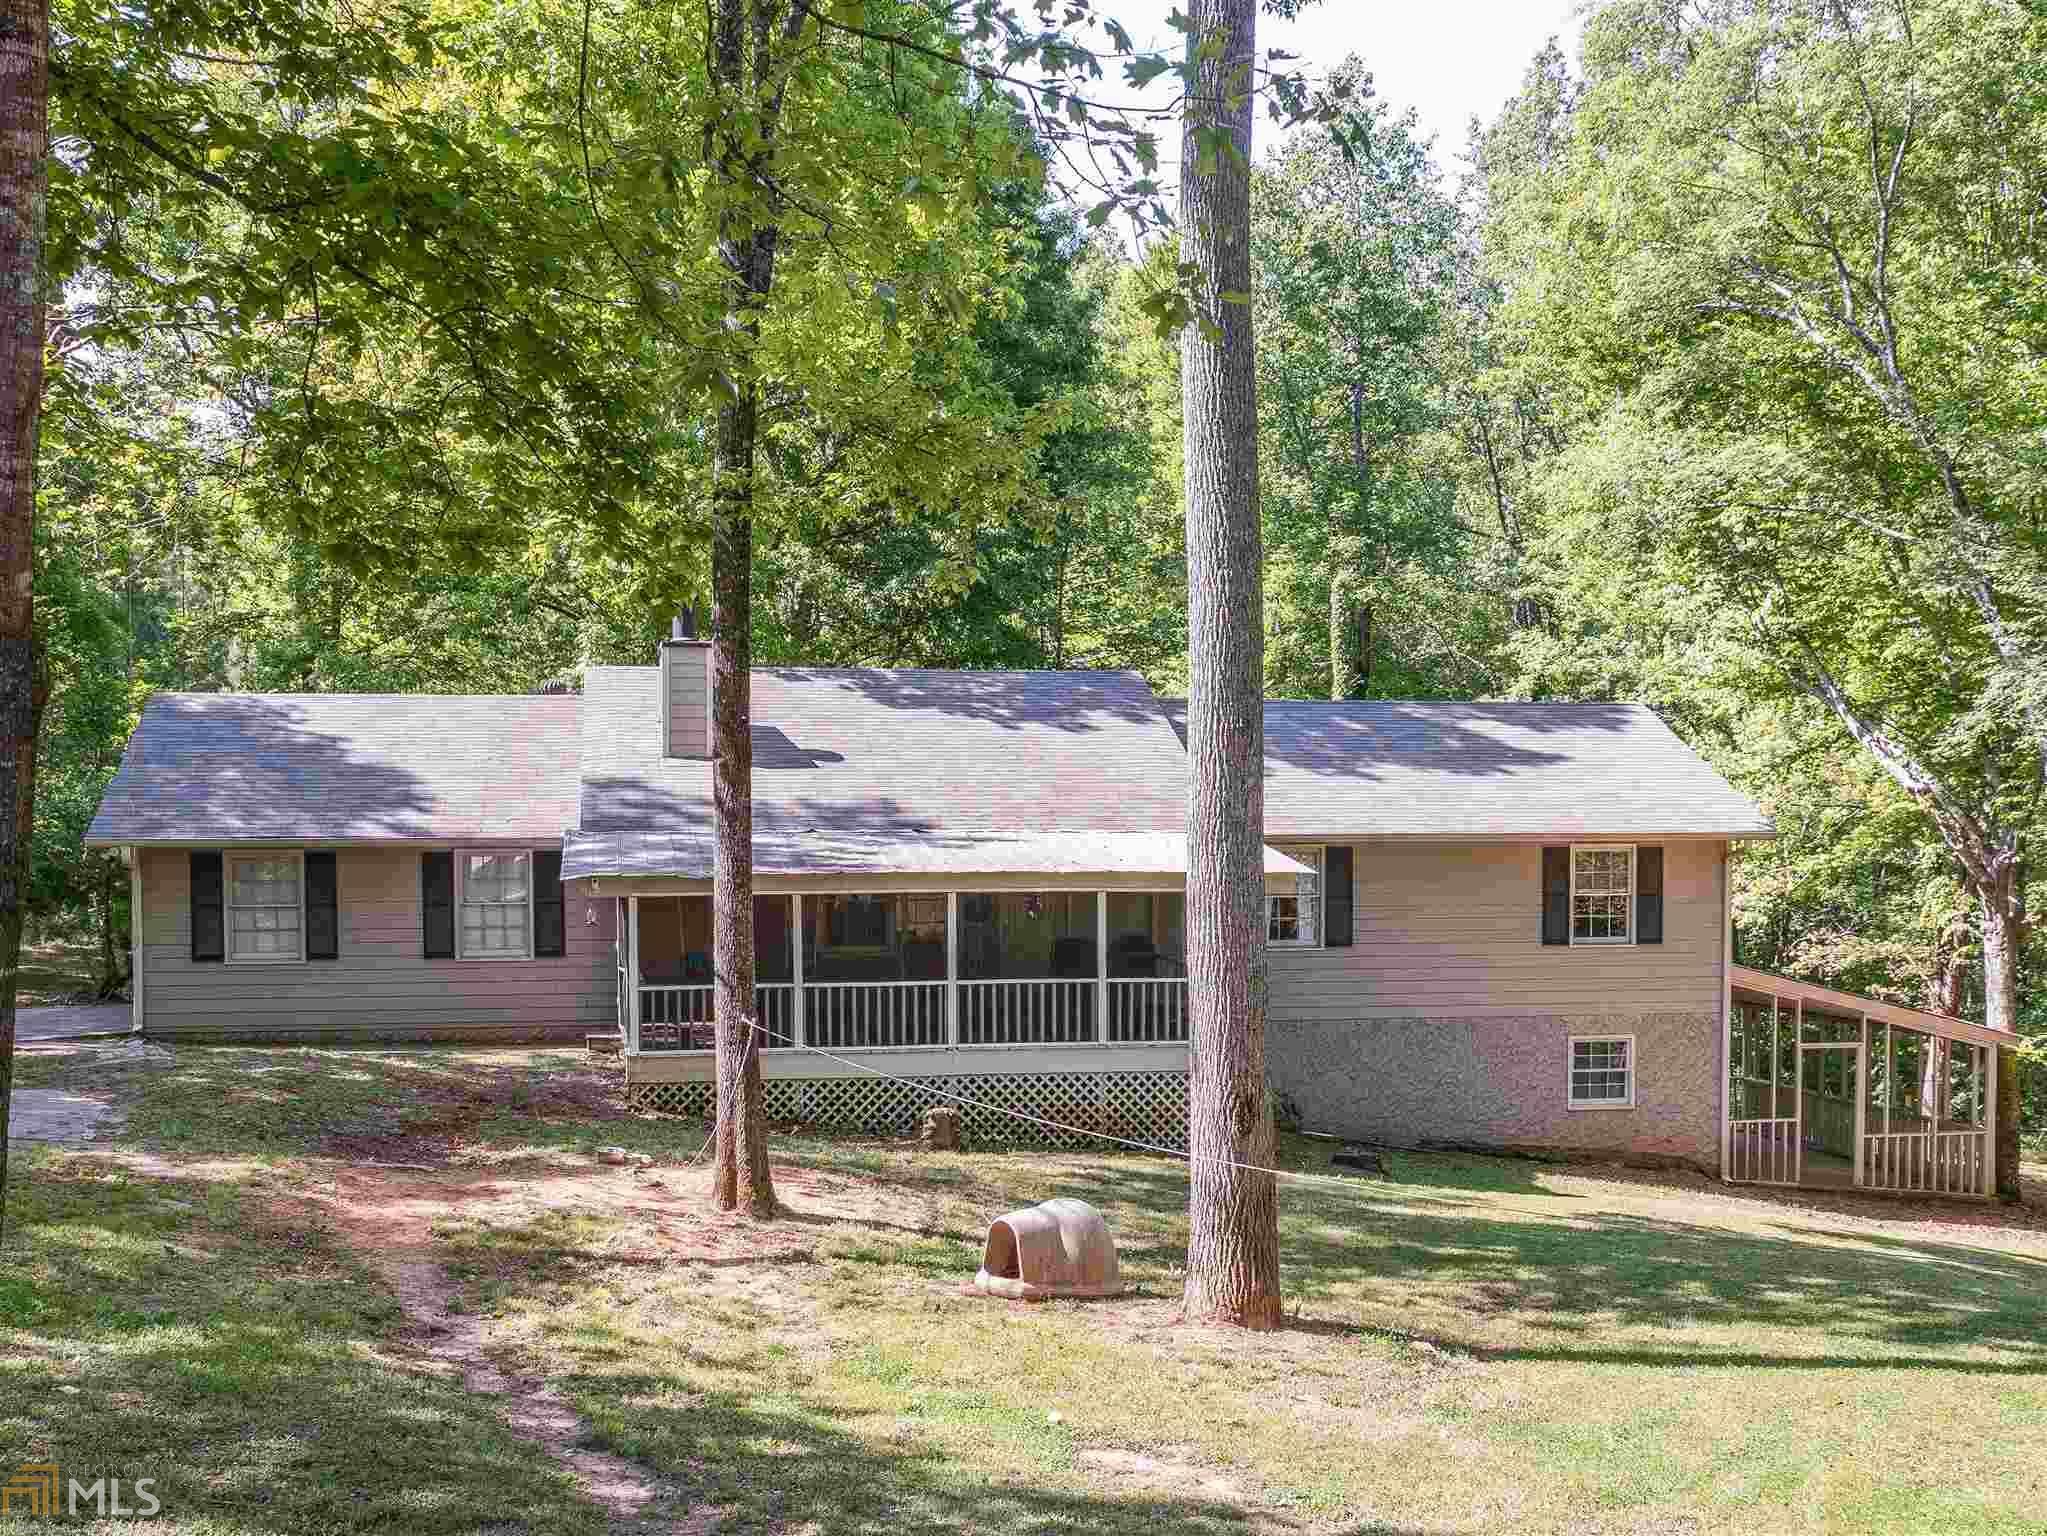 158 Willow Crk, Locust Grove, Georgia 30248, 4 Bedrooms Bedrooms, ,3 BathroomsBathrooms,Single Family,For Sale,158 Willow Crk,1,8966058